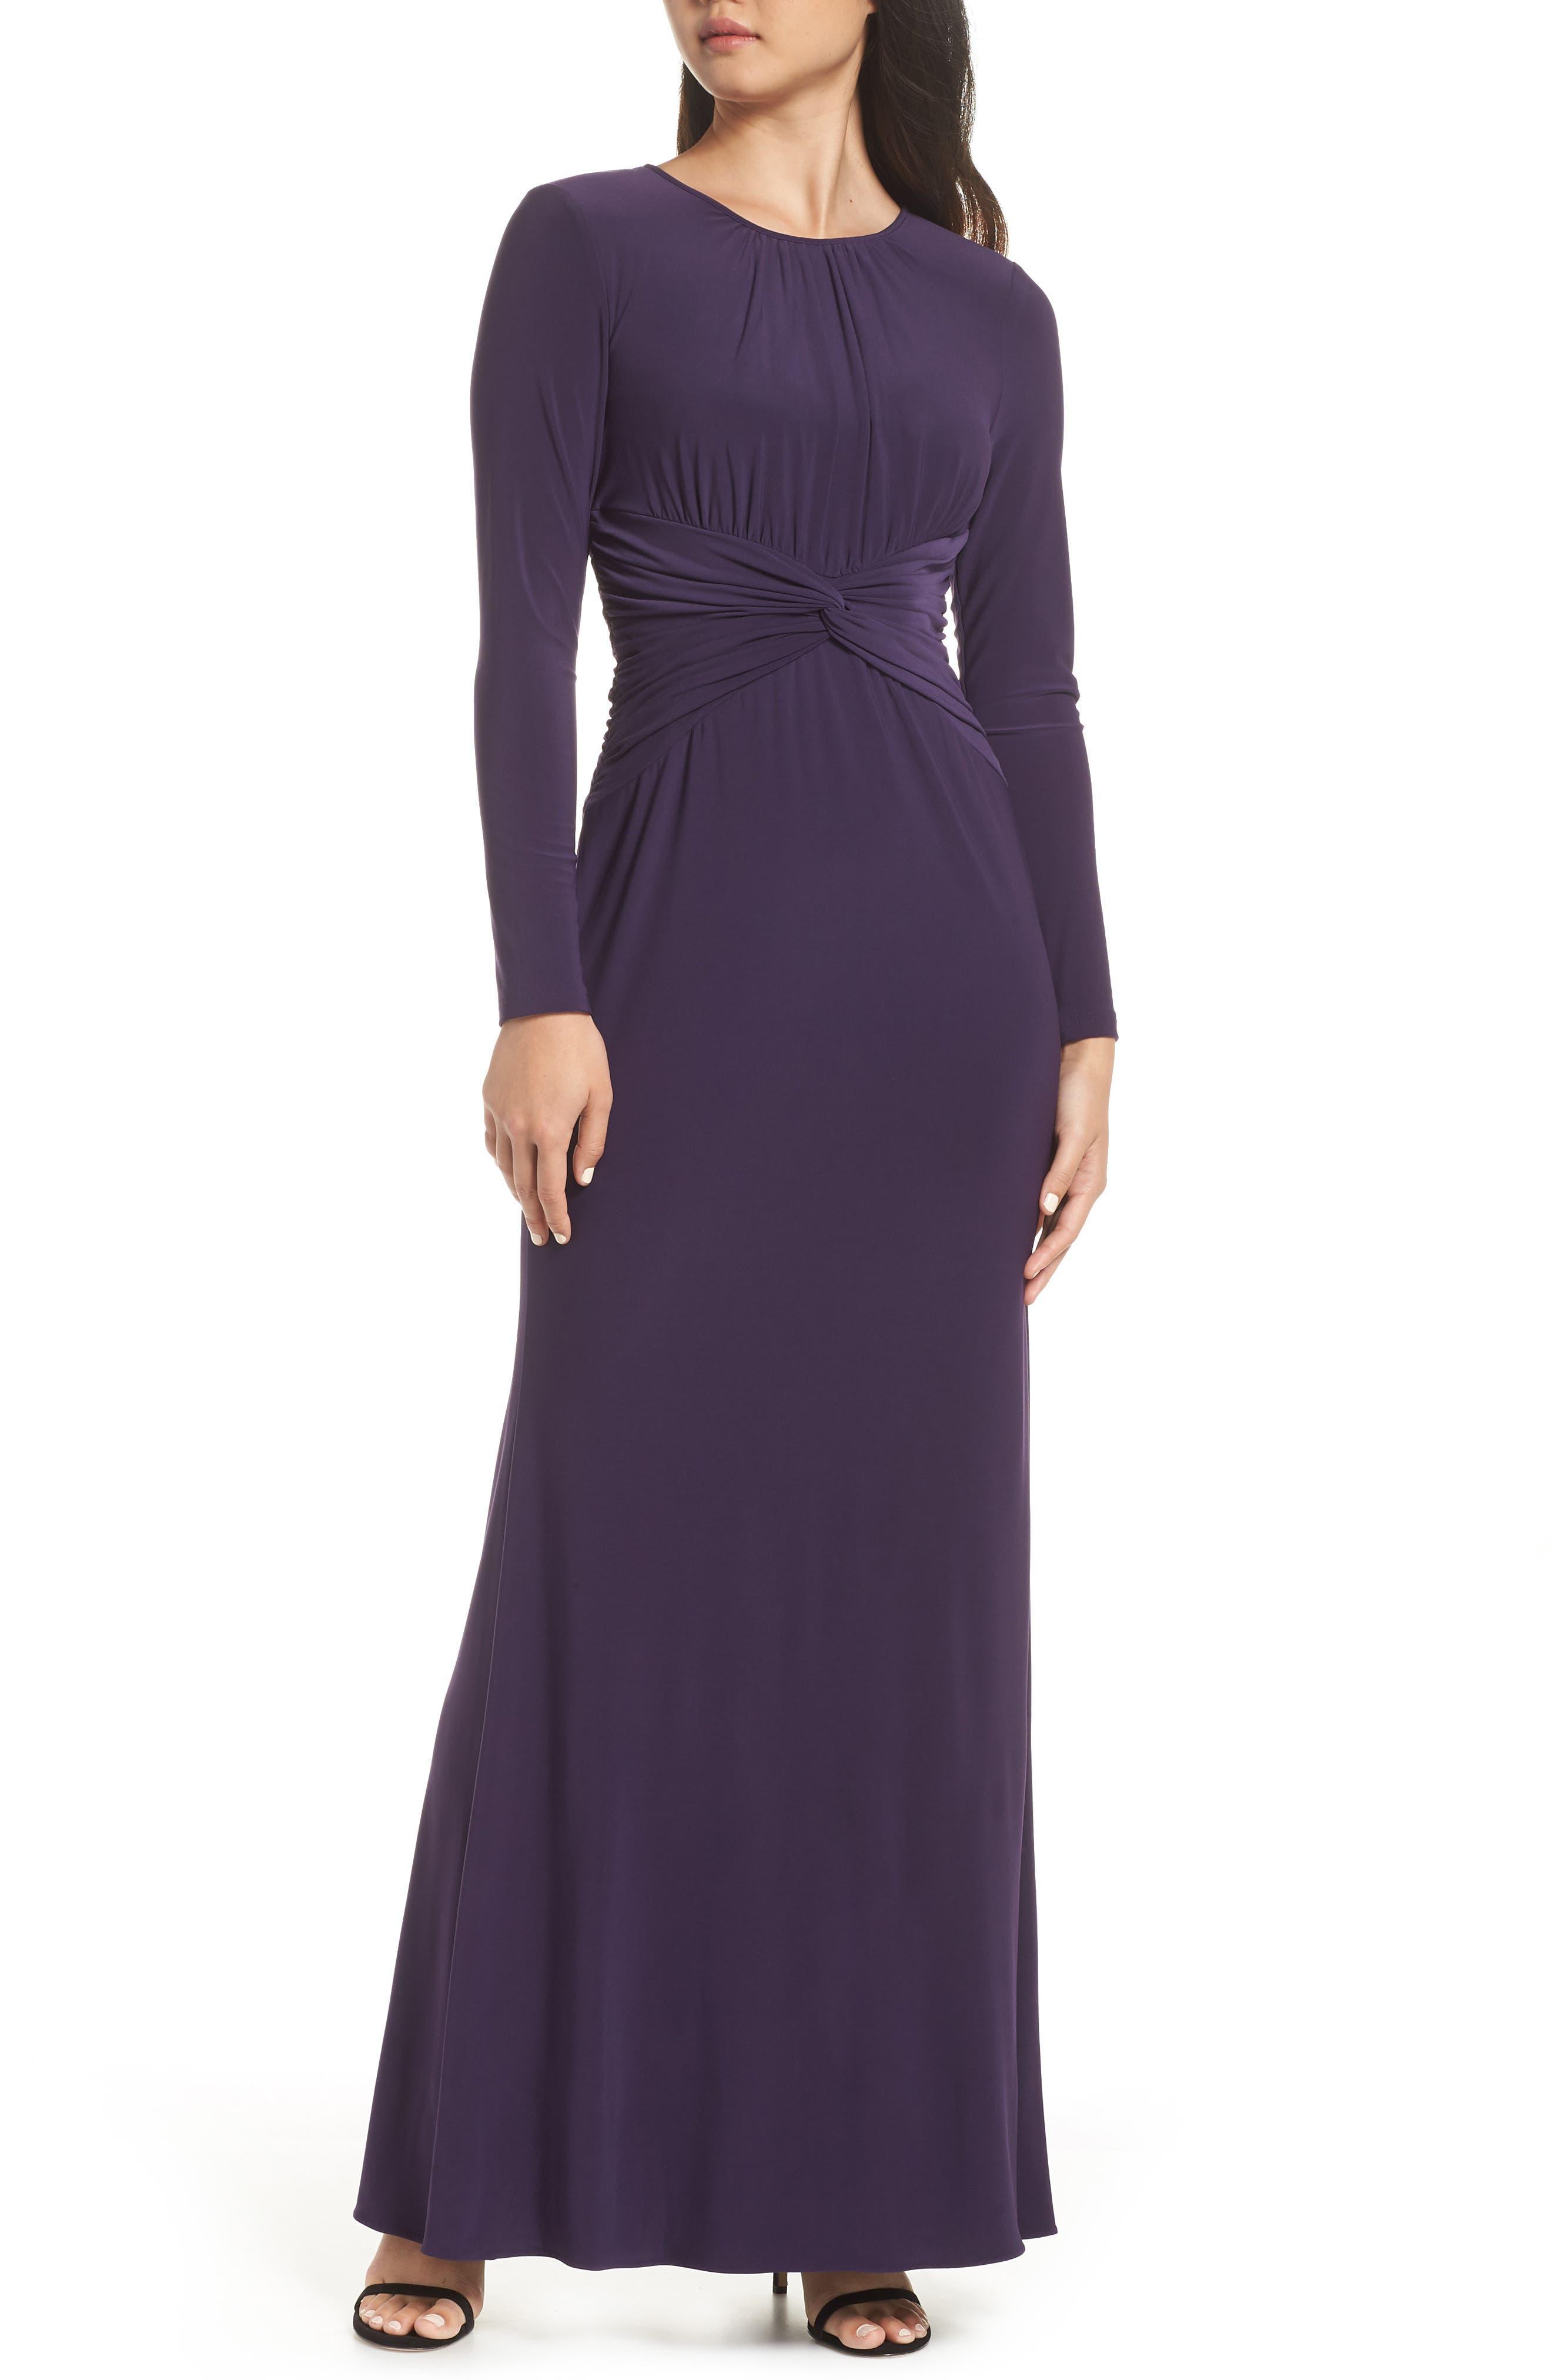 ADRIANNA PAPELL,                             Twist Waist Knit Dress,                             Main thumbnail 1, color,                             501